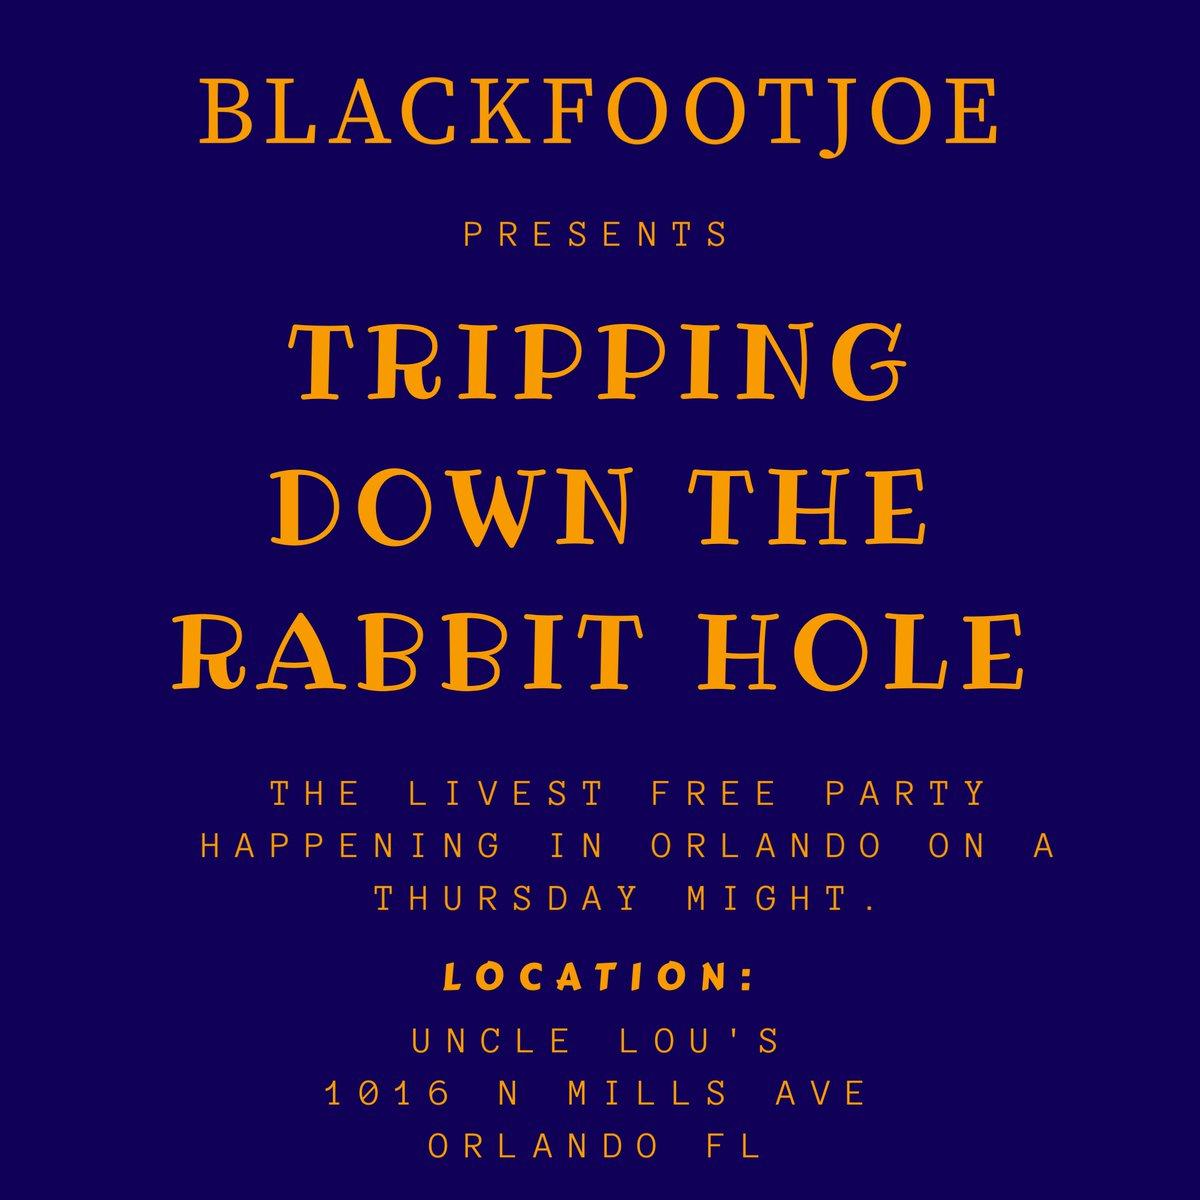 #party #orlandoparties  #Blackfootjoe #orlandoparty#undergroundhiphop#positivevibes#freeparty #positivenight #orlandorap#orlandohiphop